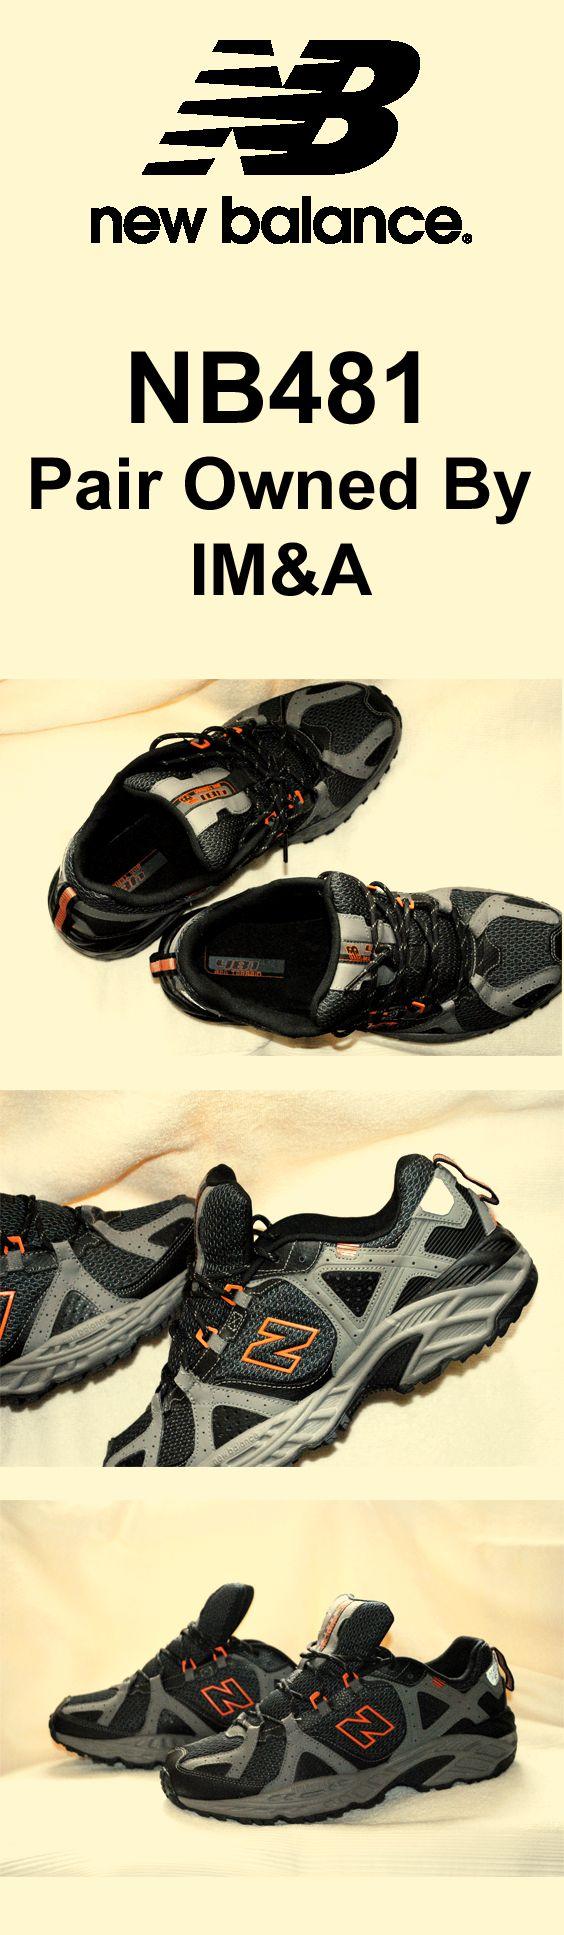 New Balance 481. Indoor training shoes. Indoor cycling shoes. Indoor exercise shoes. Gym shoes. Running shoes. Men's shoes. Men's fashion.